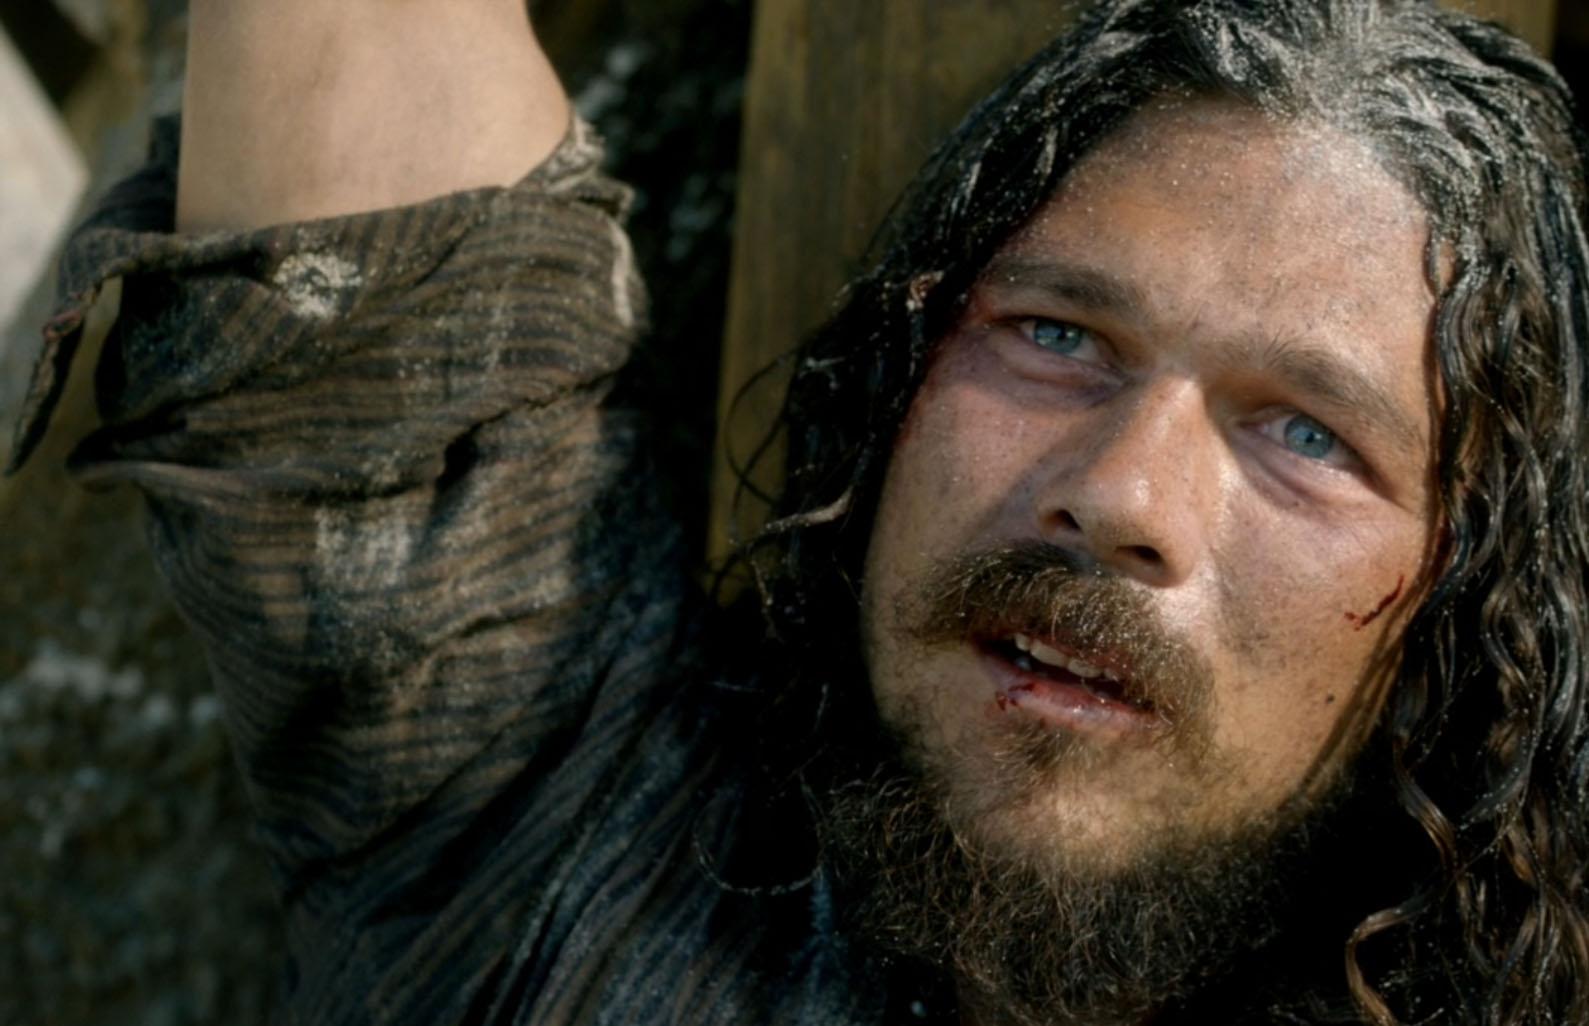 Black Sails Season 4 Episode 2 John Silver Israel Hands